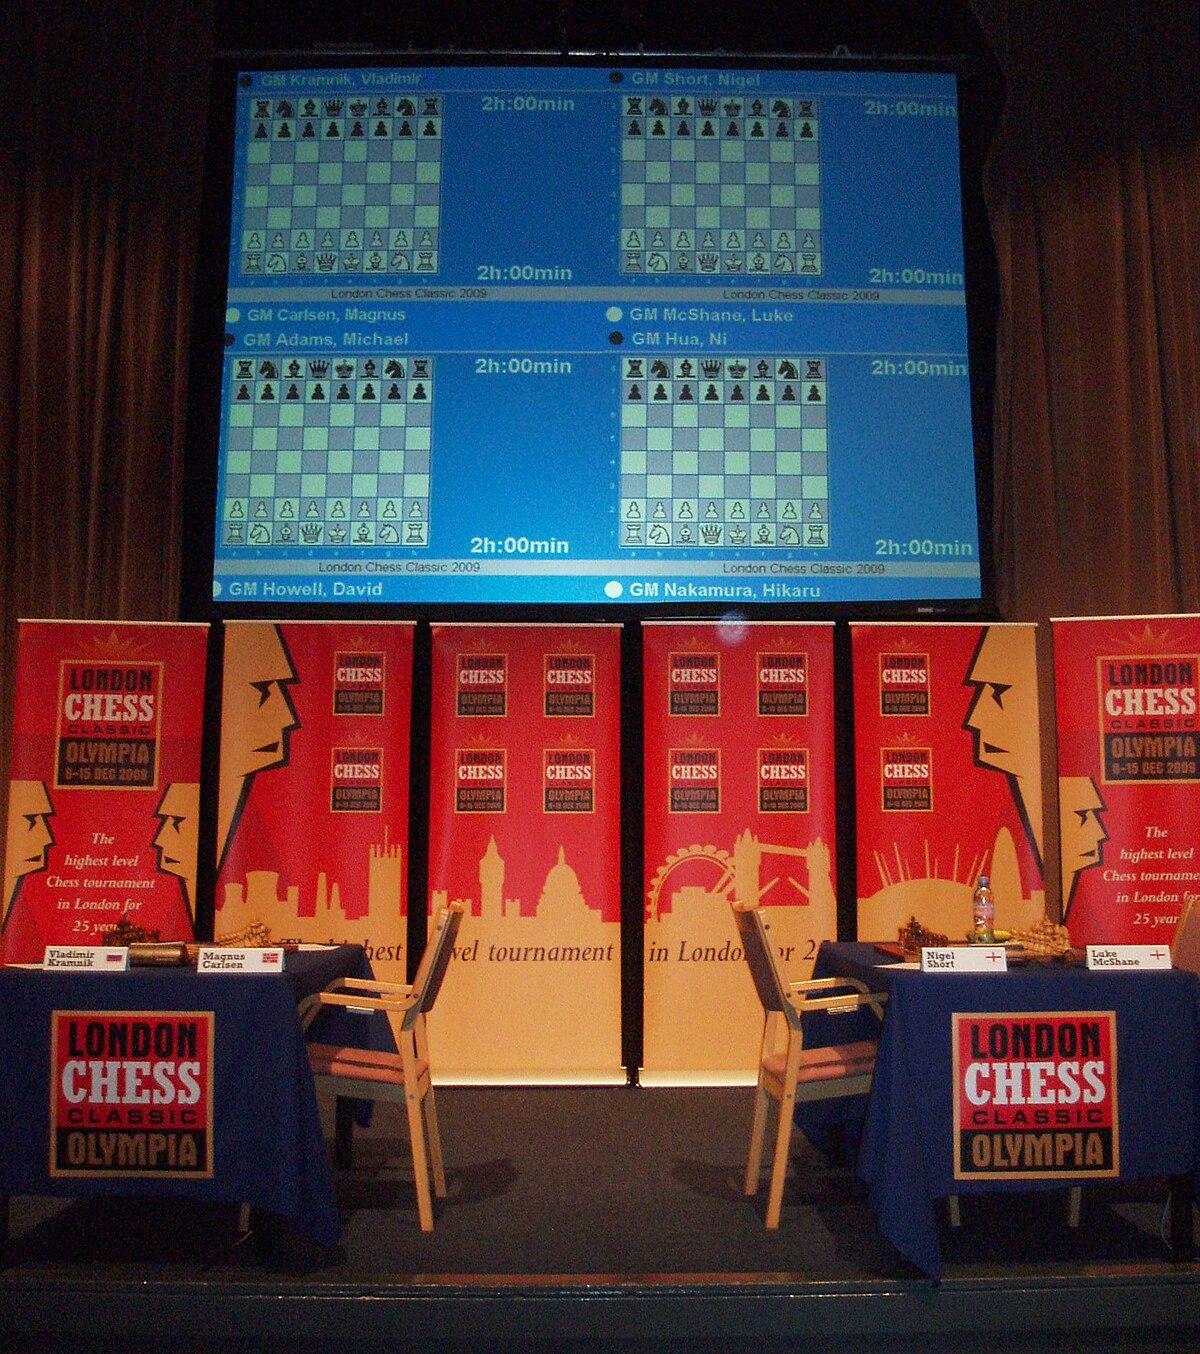 london chess classics